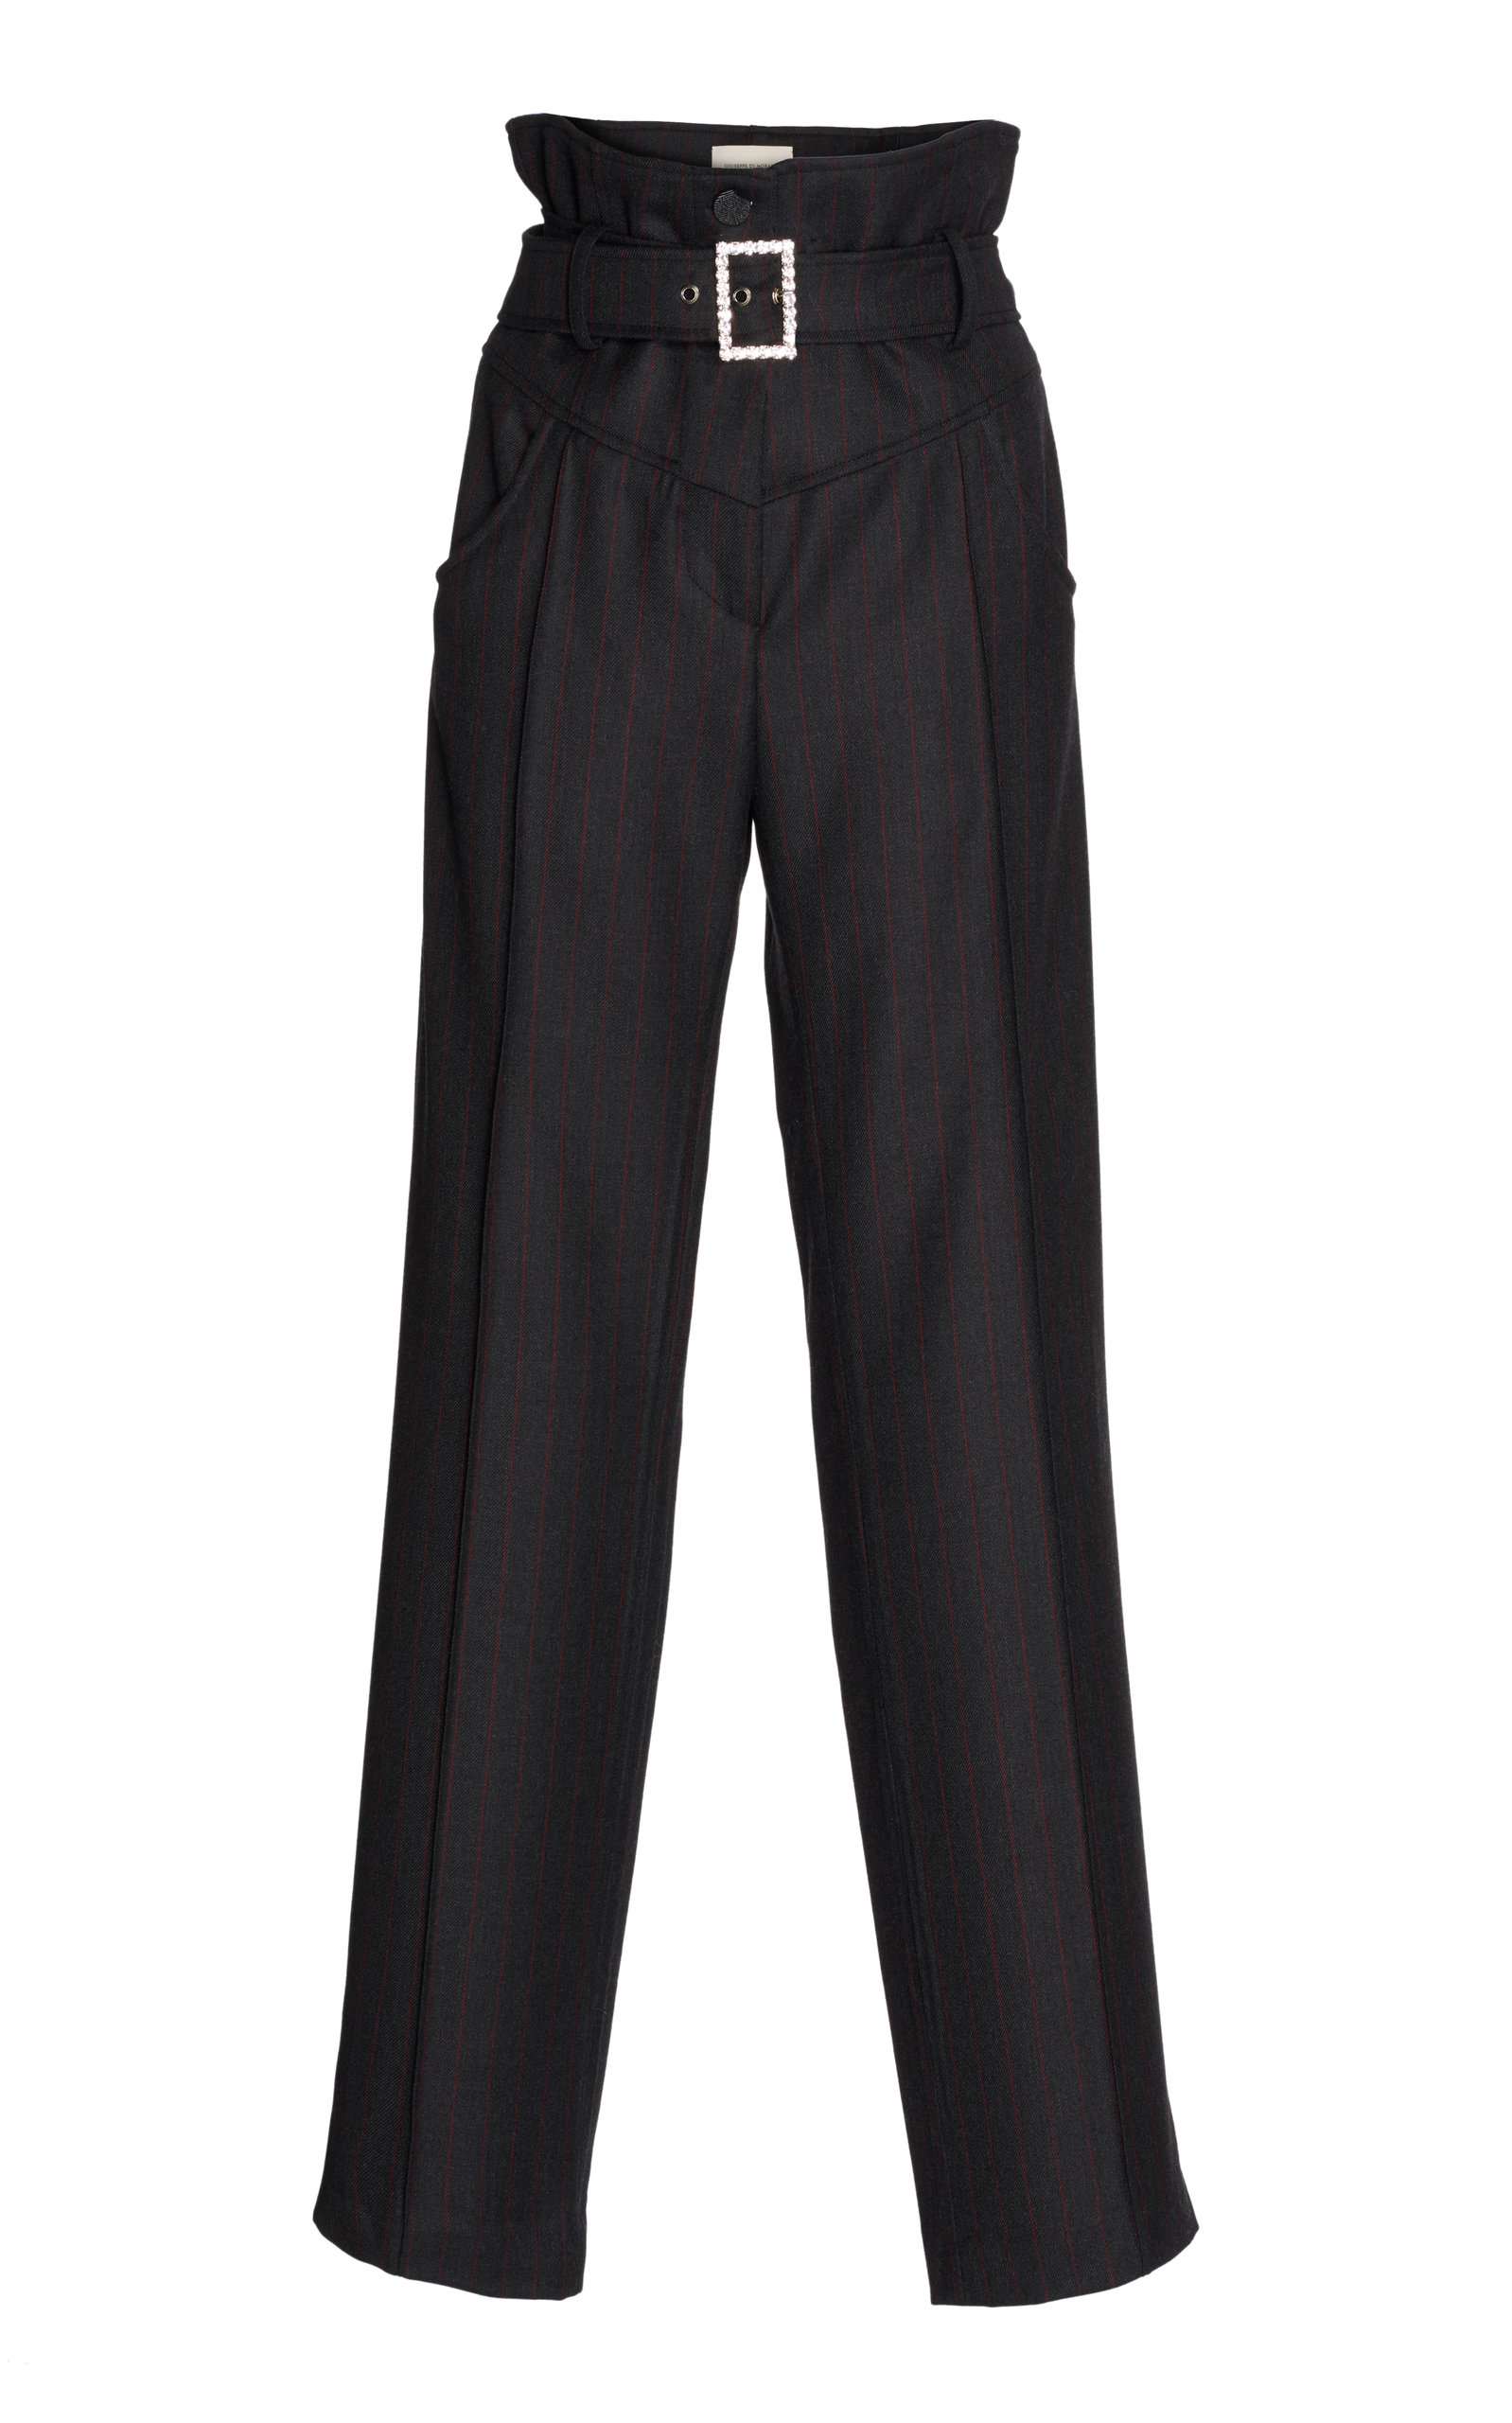 GIUSEPPE DI MORABITO Pinstripe Wool Trouser in Grey